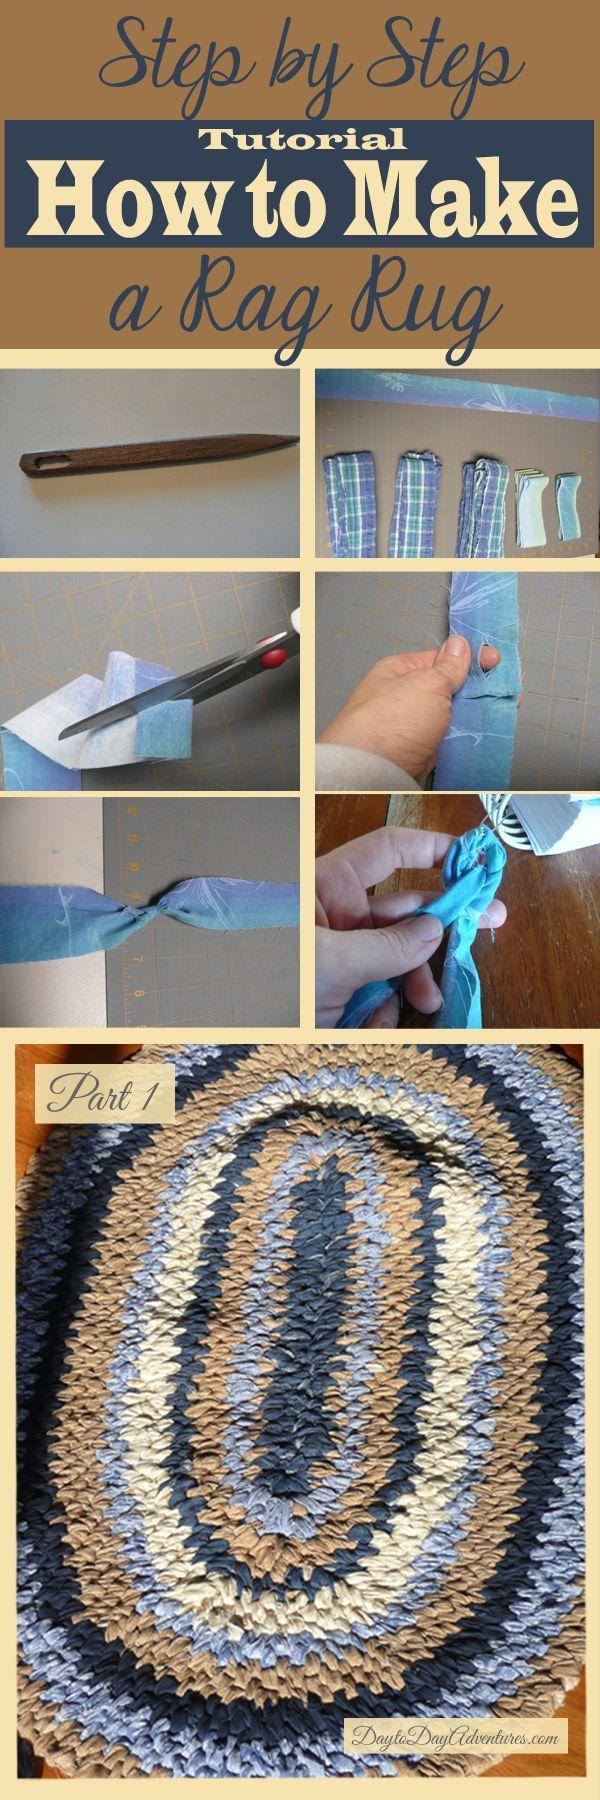 Making Toothbrush Rag Rug Tutorial Part 1 of 4 - DaytoDayAdventures.com